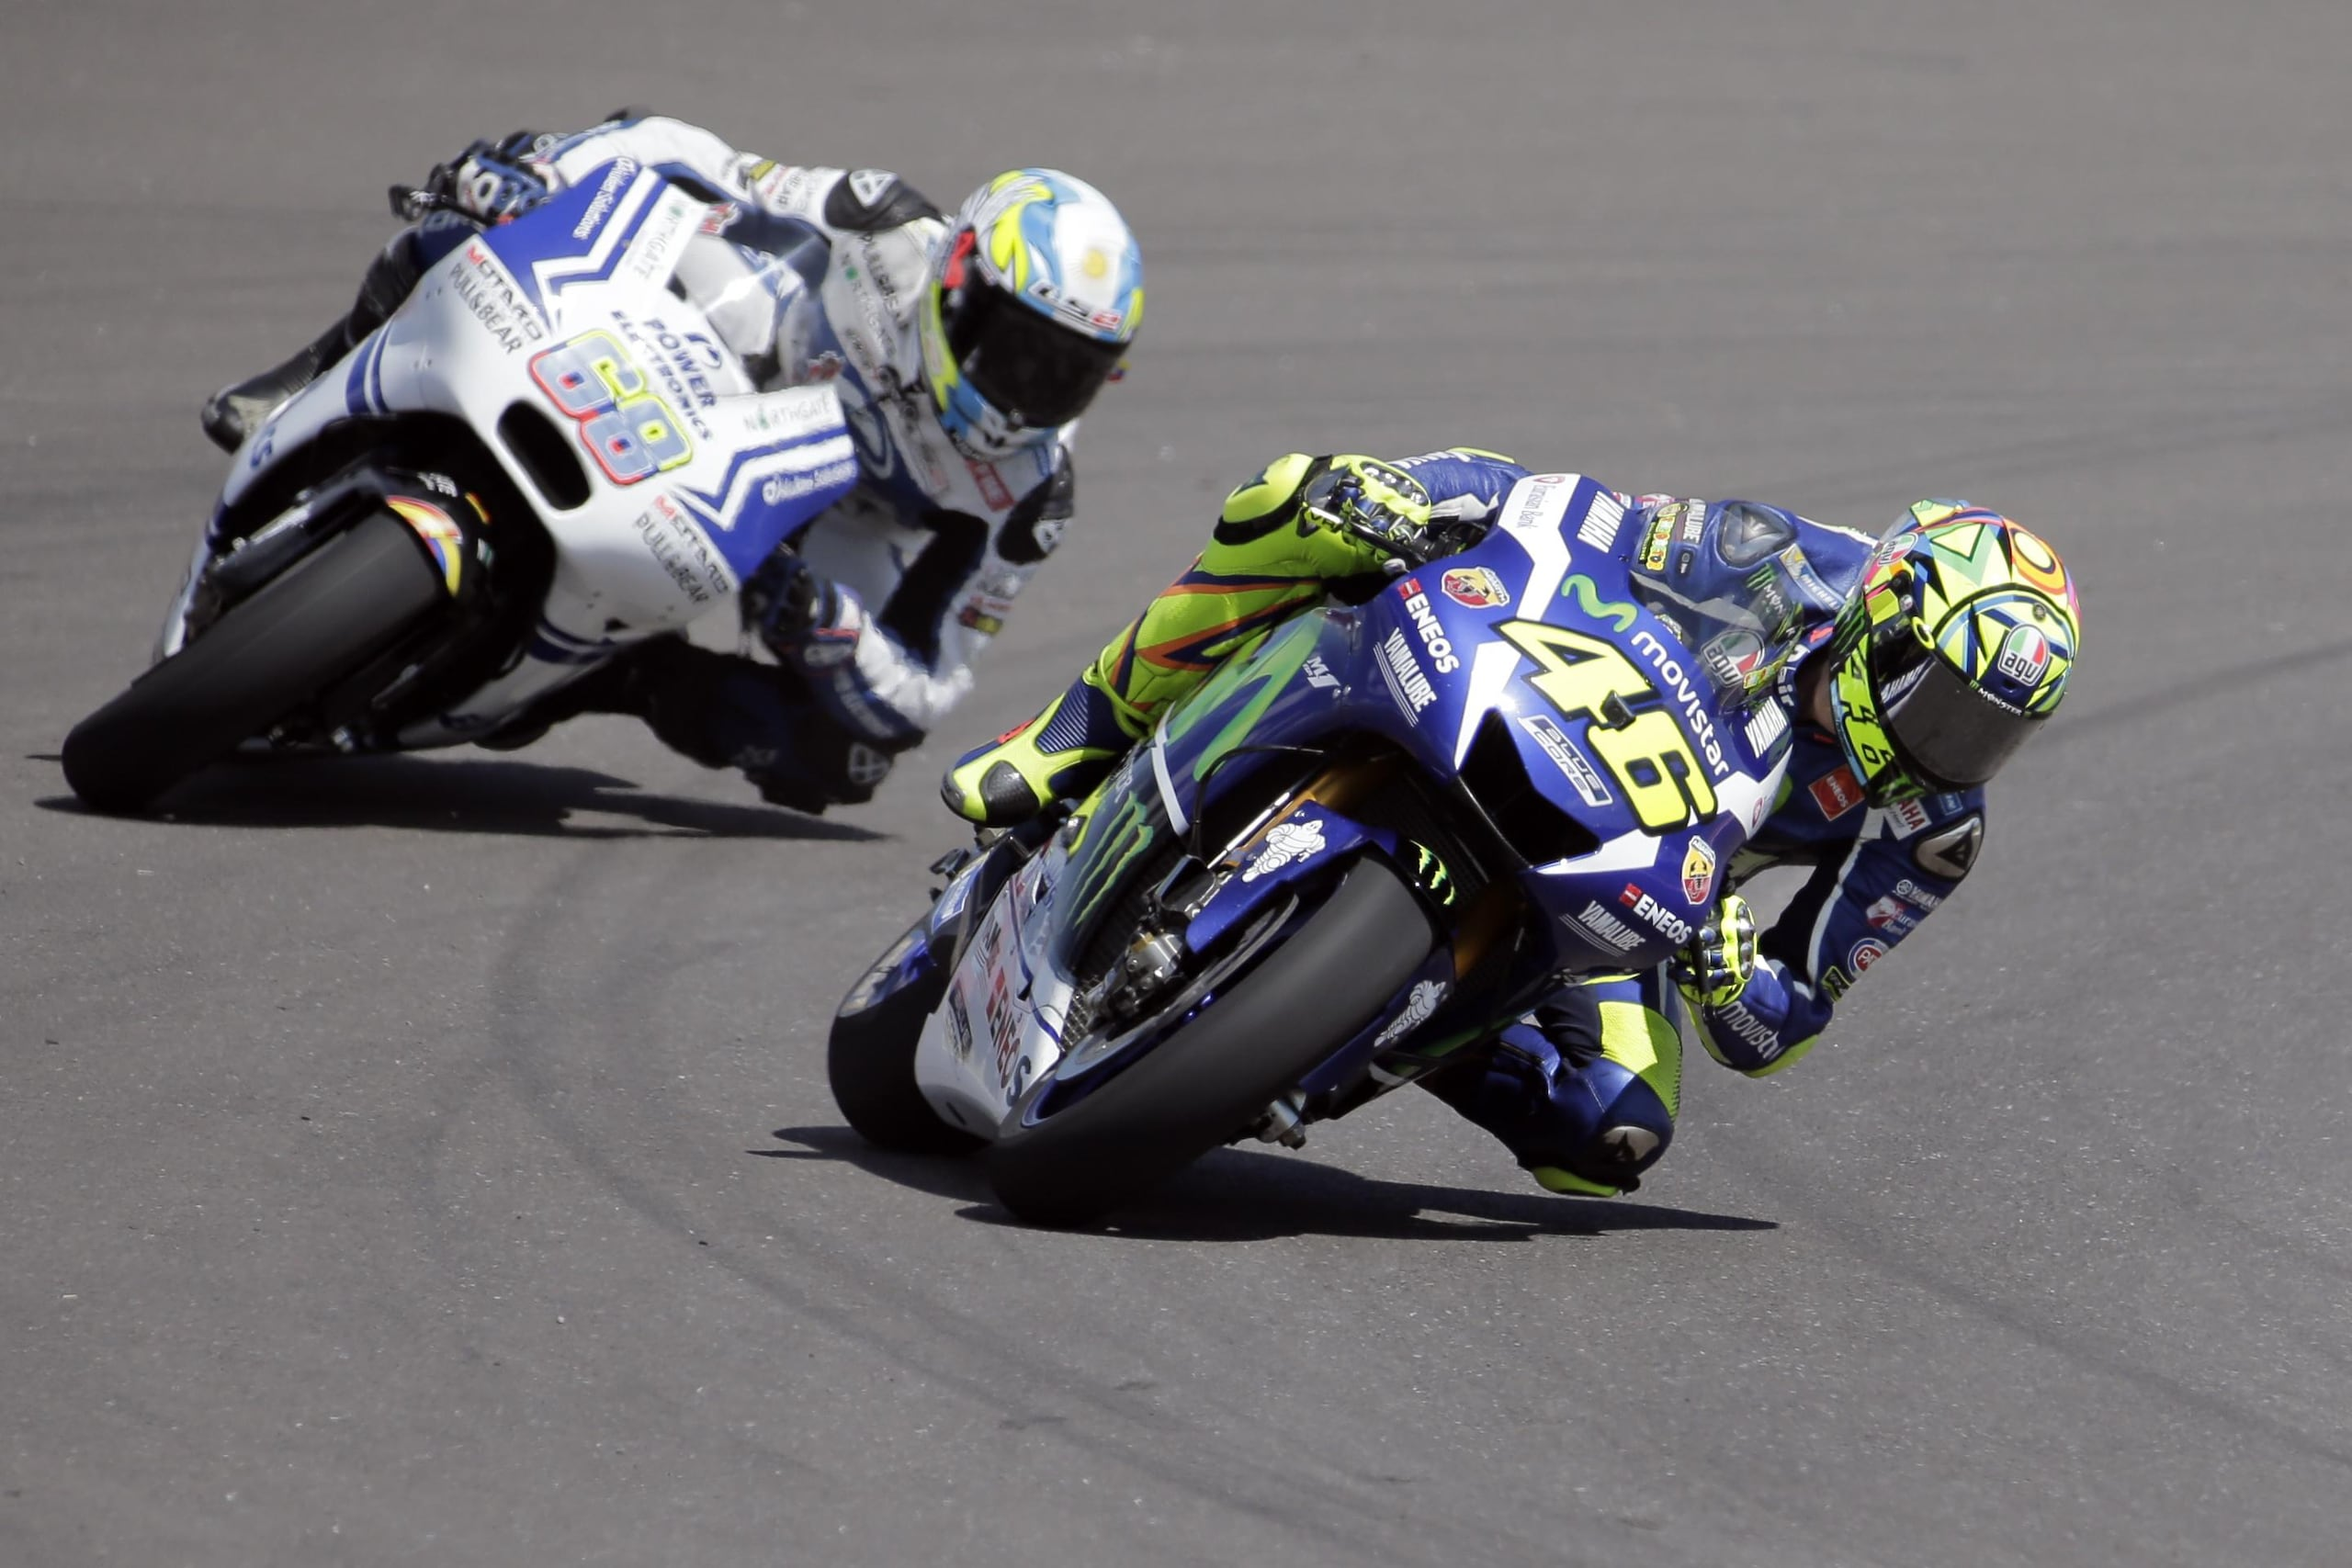 MotoGp Silverstone, Hernandez vola nel Warm Up